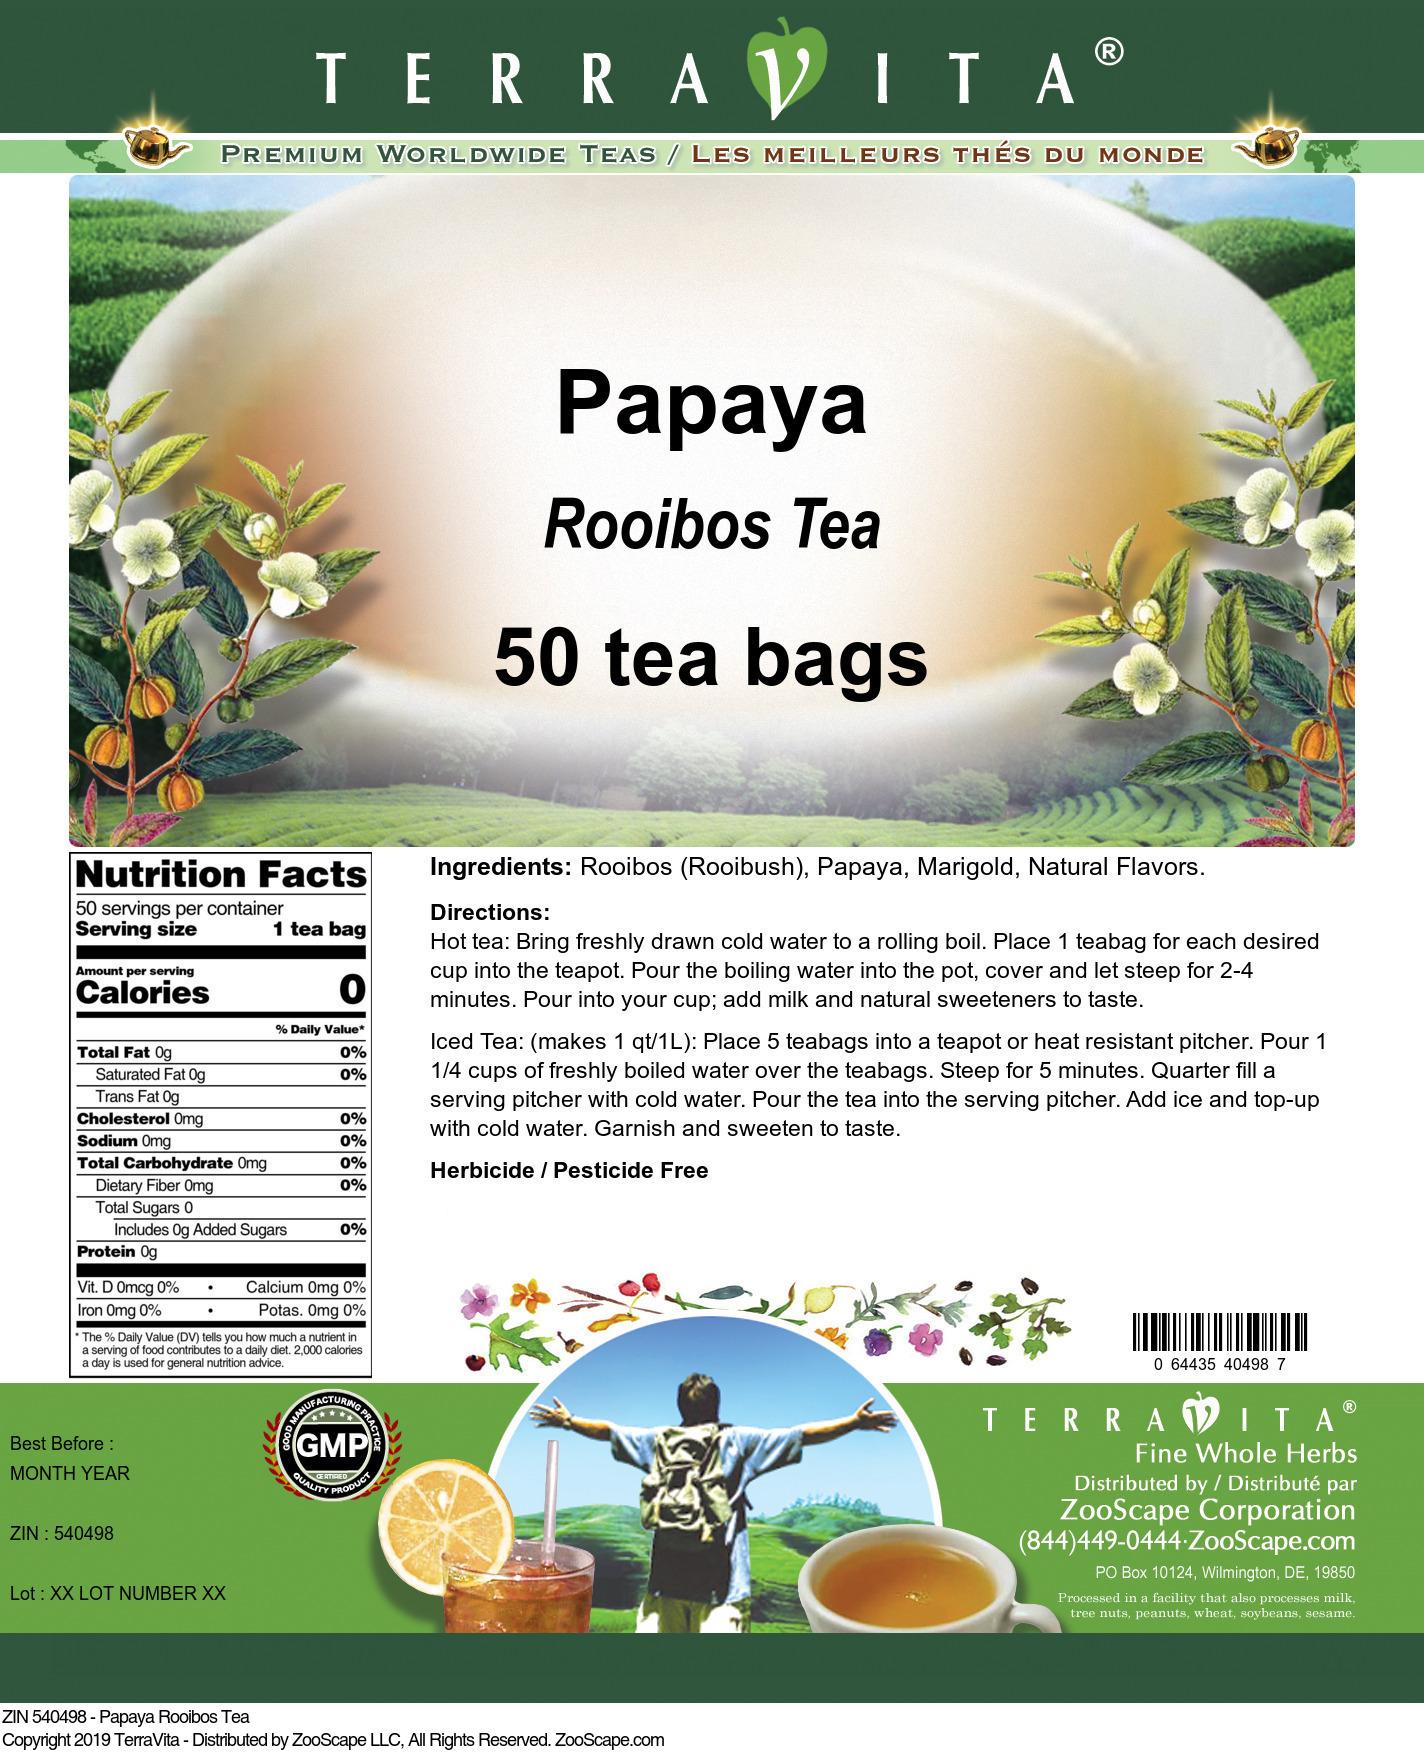 Papaya Rooibos Tea